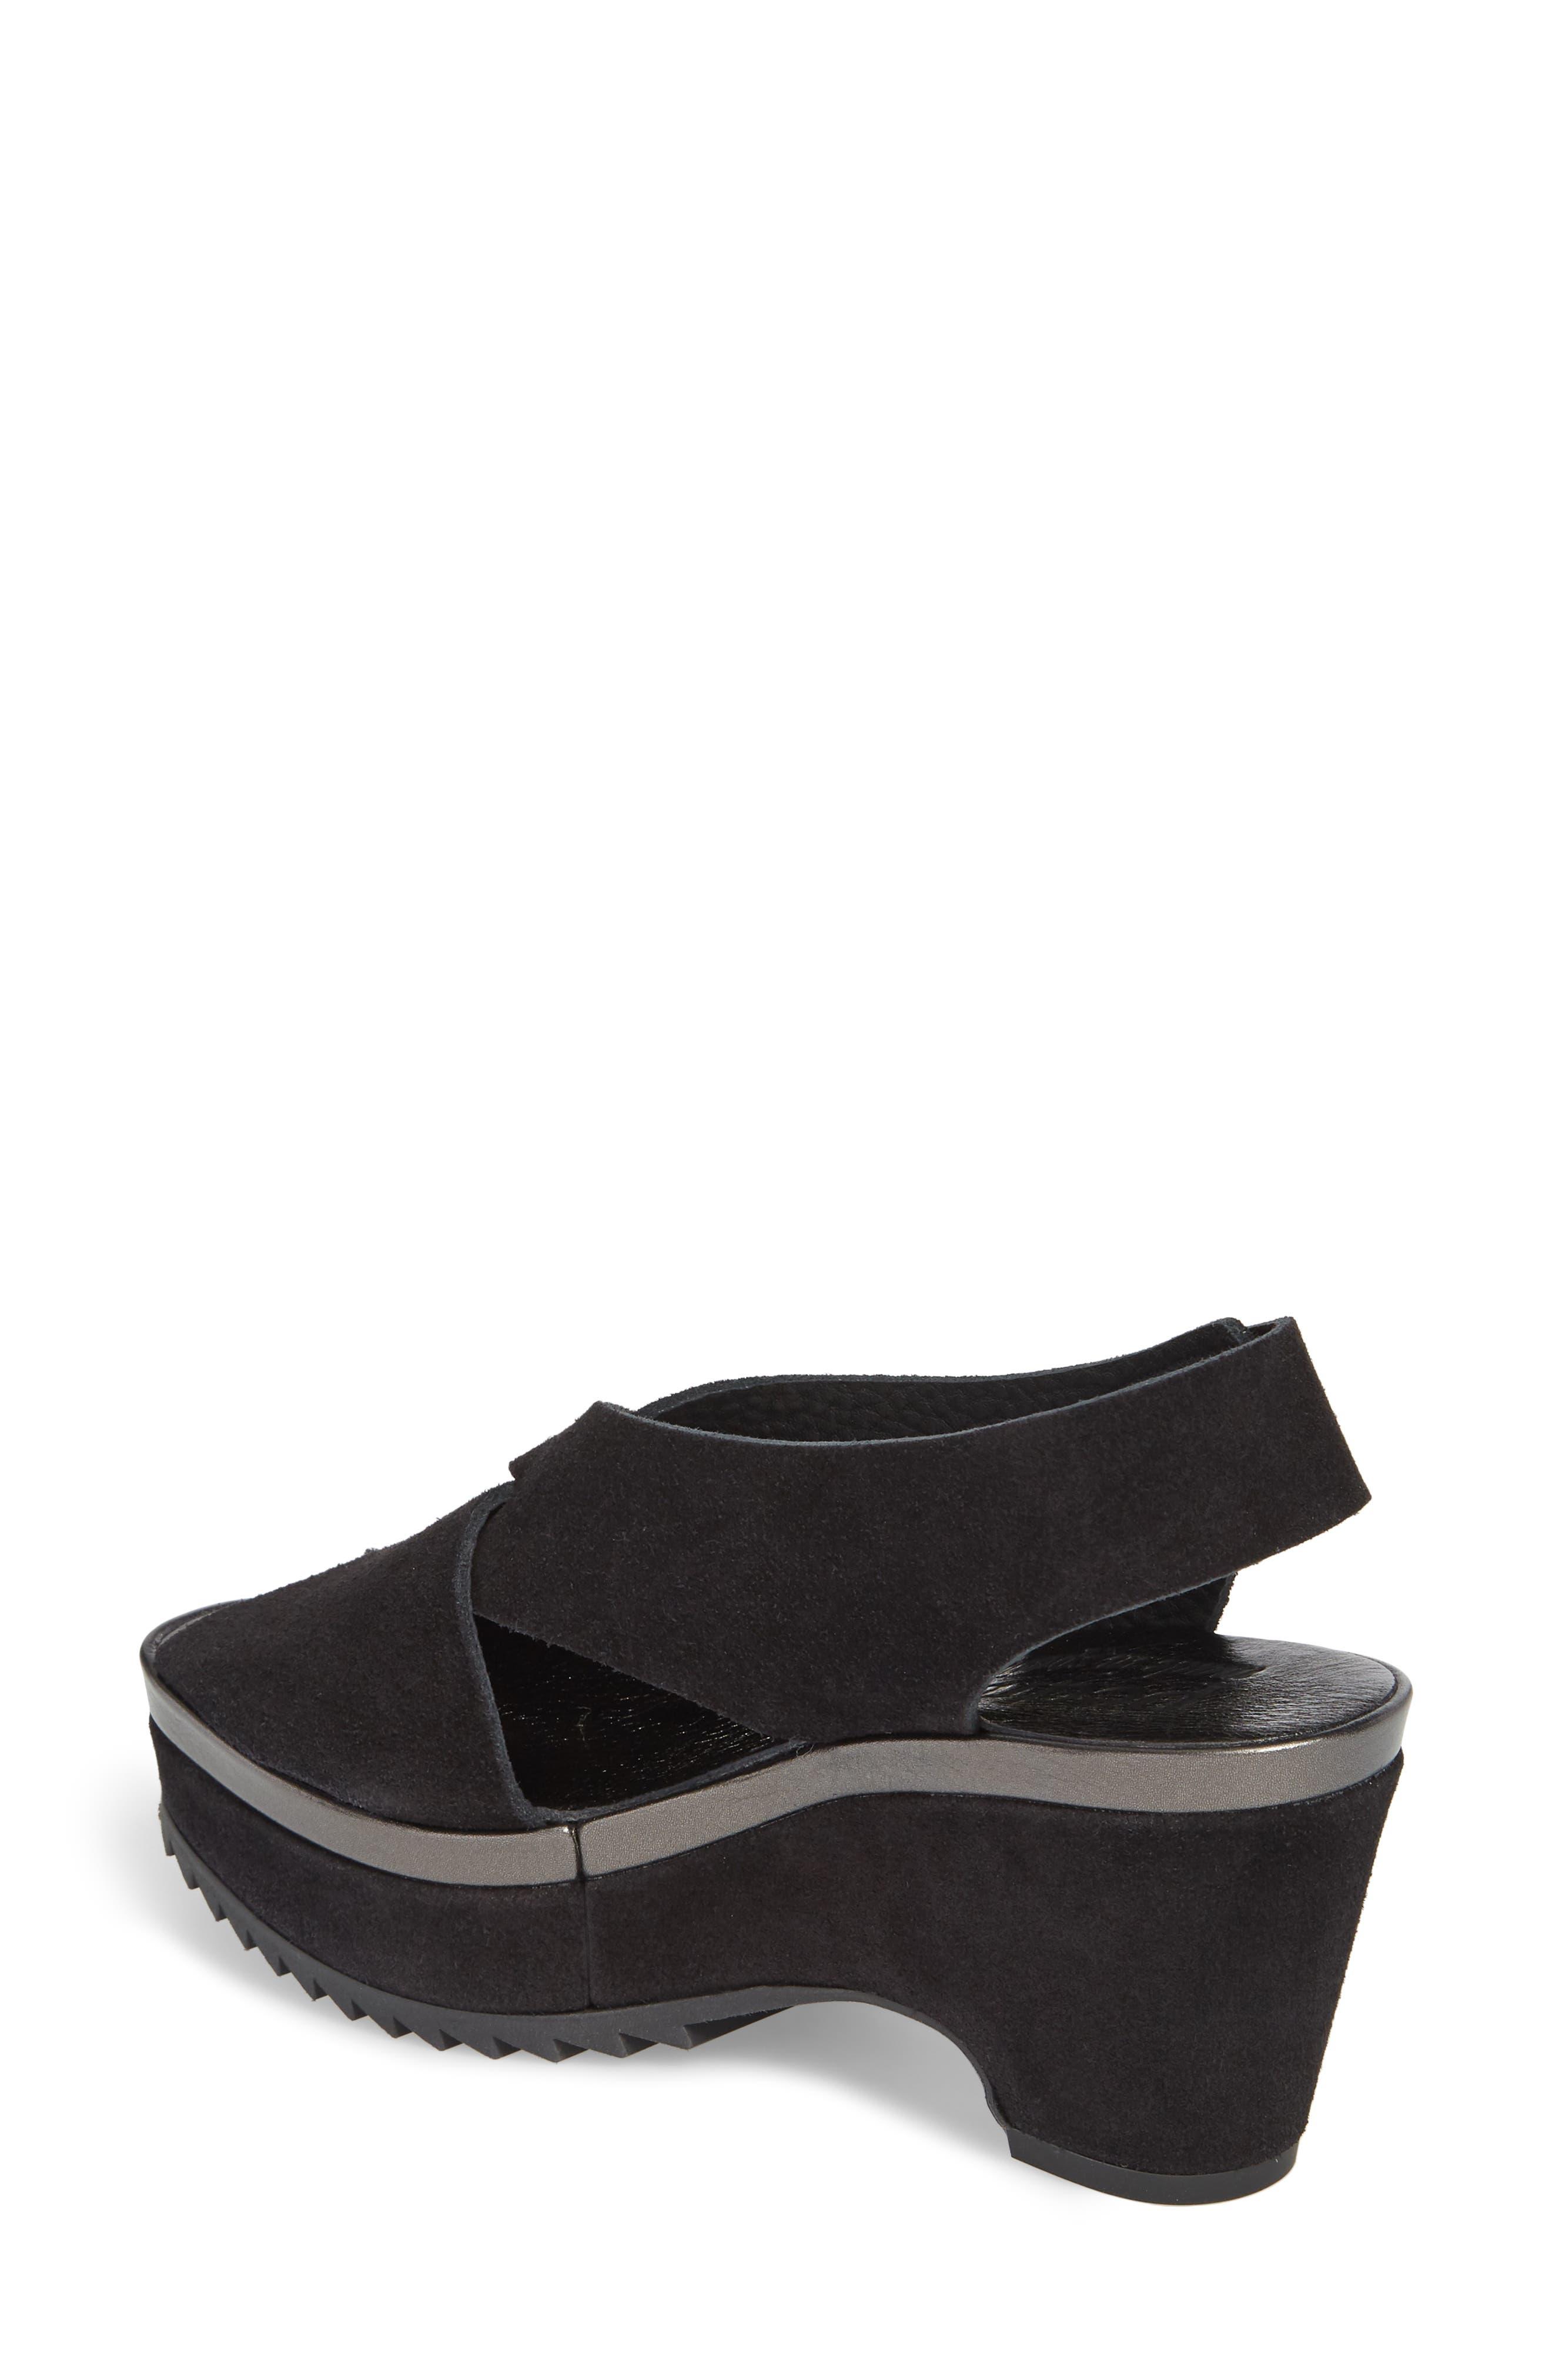 Fayre Cross Strap Wedge Sandal,                             Alternate thumbnail 2, color,                             BLACK